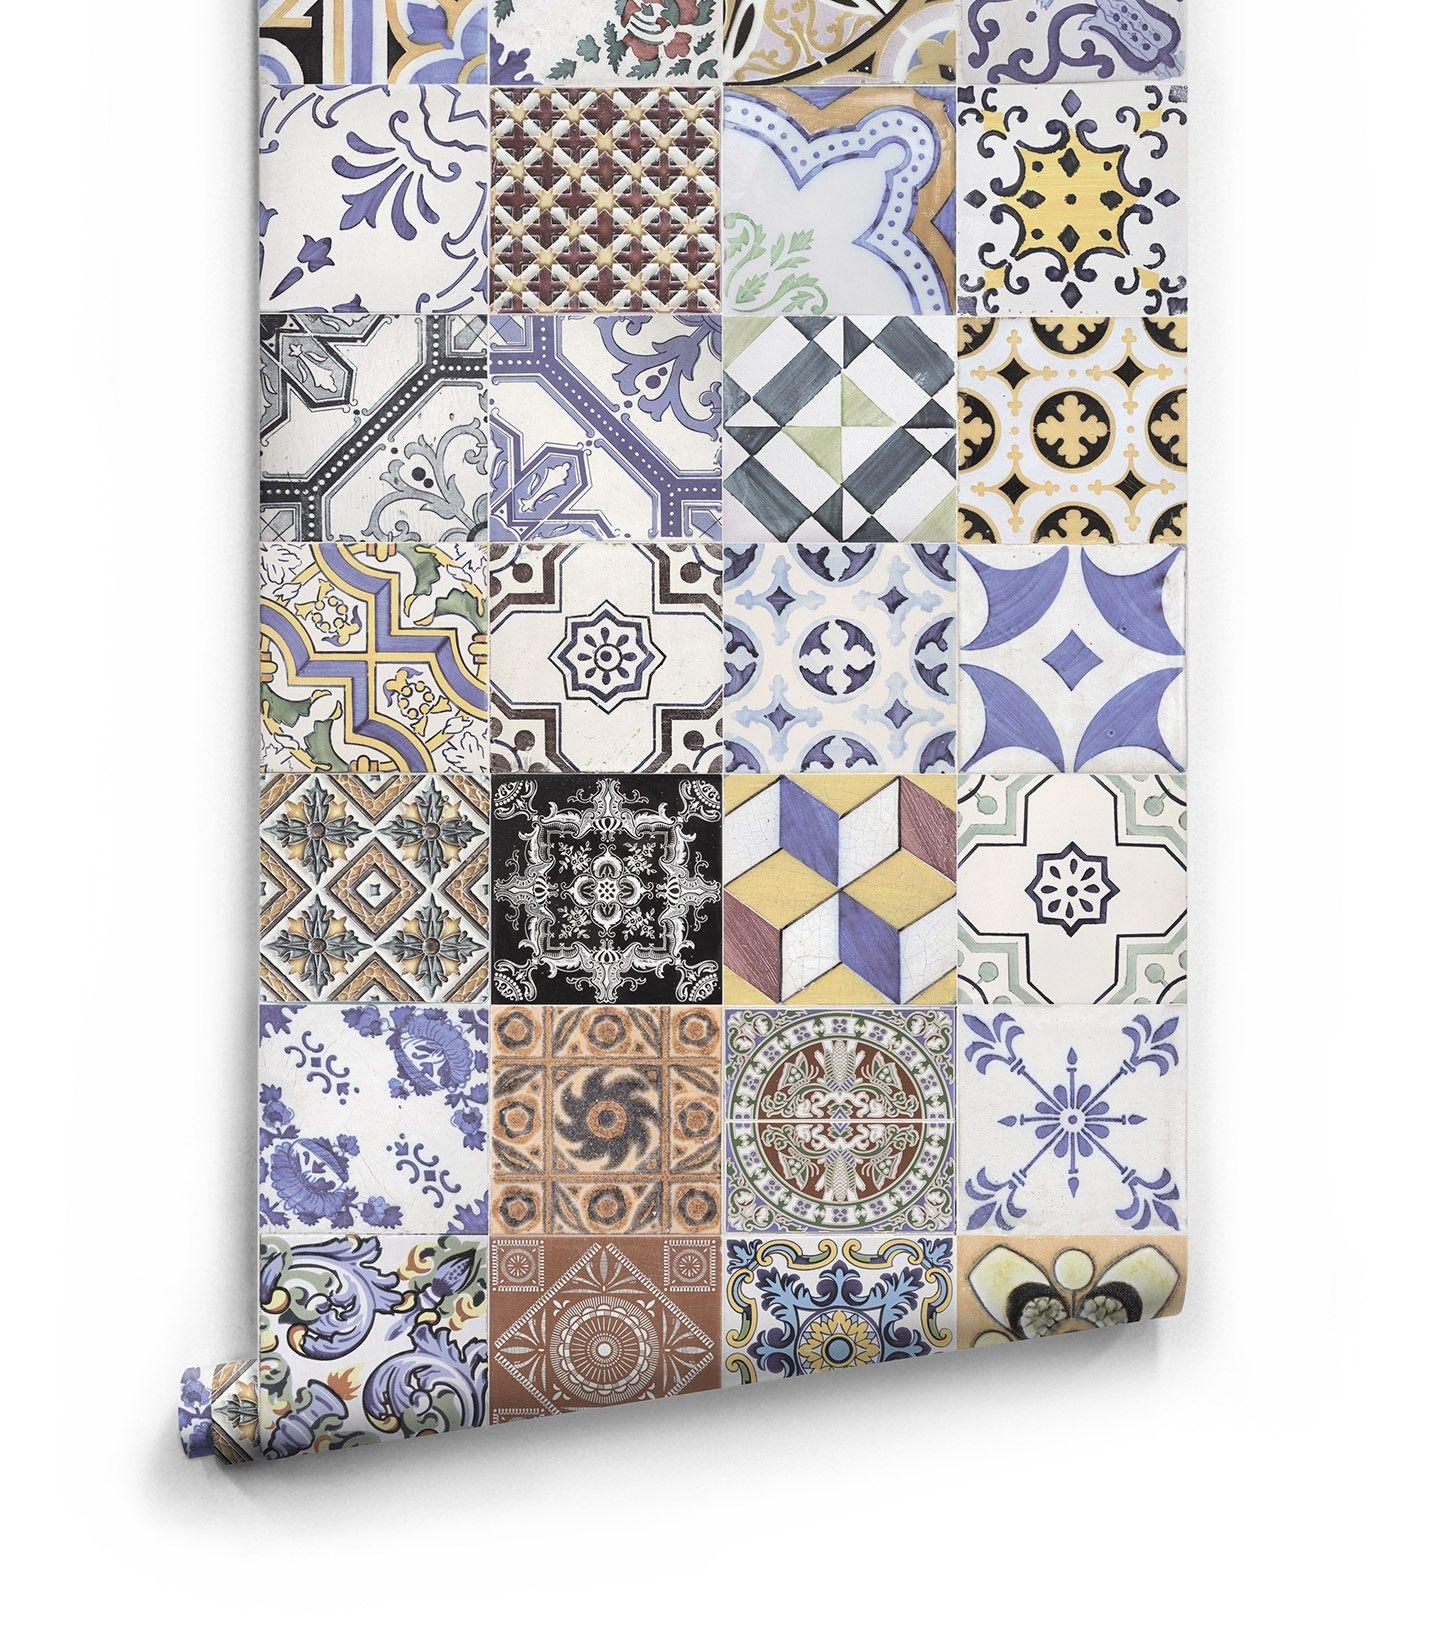 Federation Tiles Wallpaper • Vintage Ceramic Tiles (With